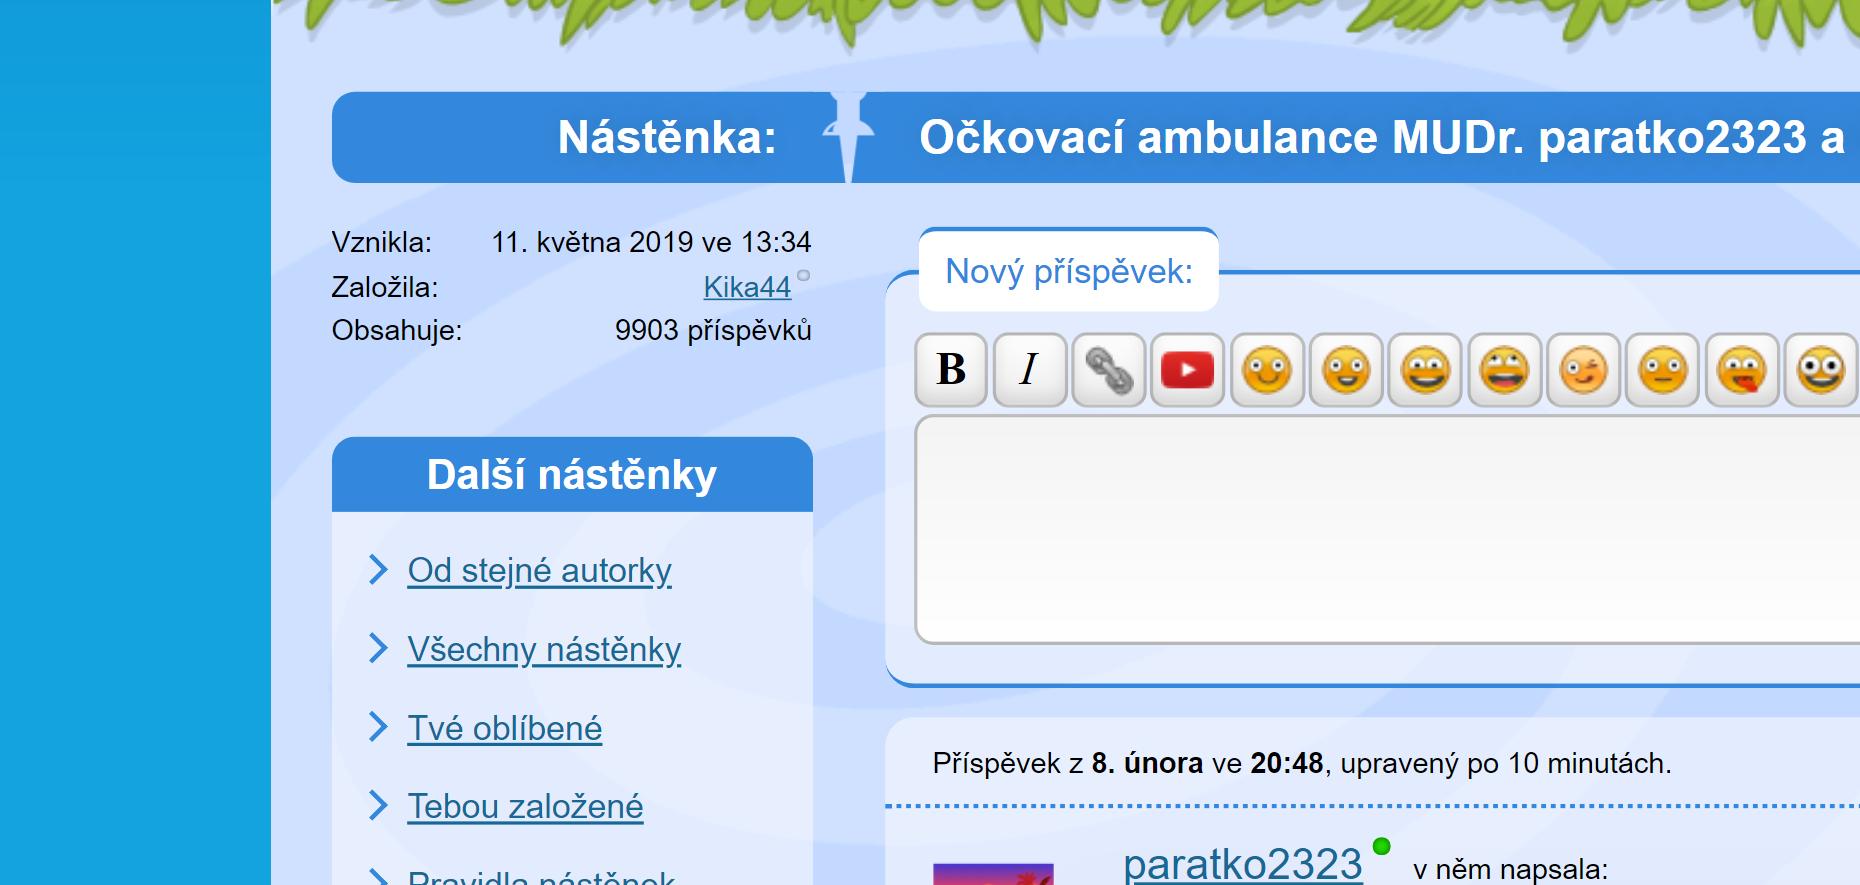 opera-snimek_2020-02-08_210850_www.alik.cz.png